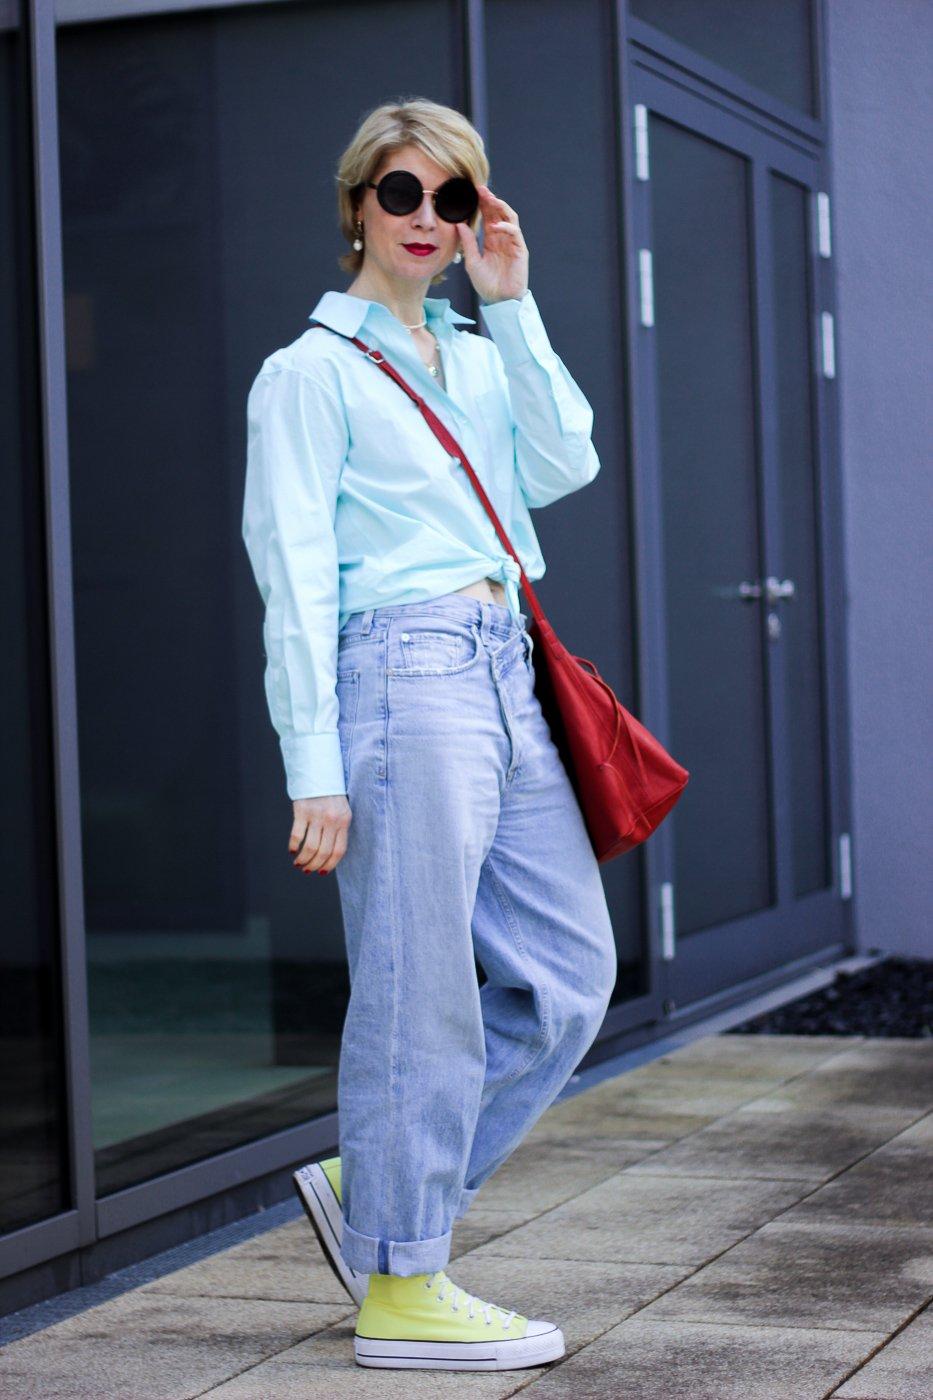 conny doll lifestyle: Noble Blässe vs. Sommerteint - Hemd mit Knoten kombiniert mit Jeans